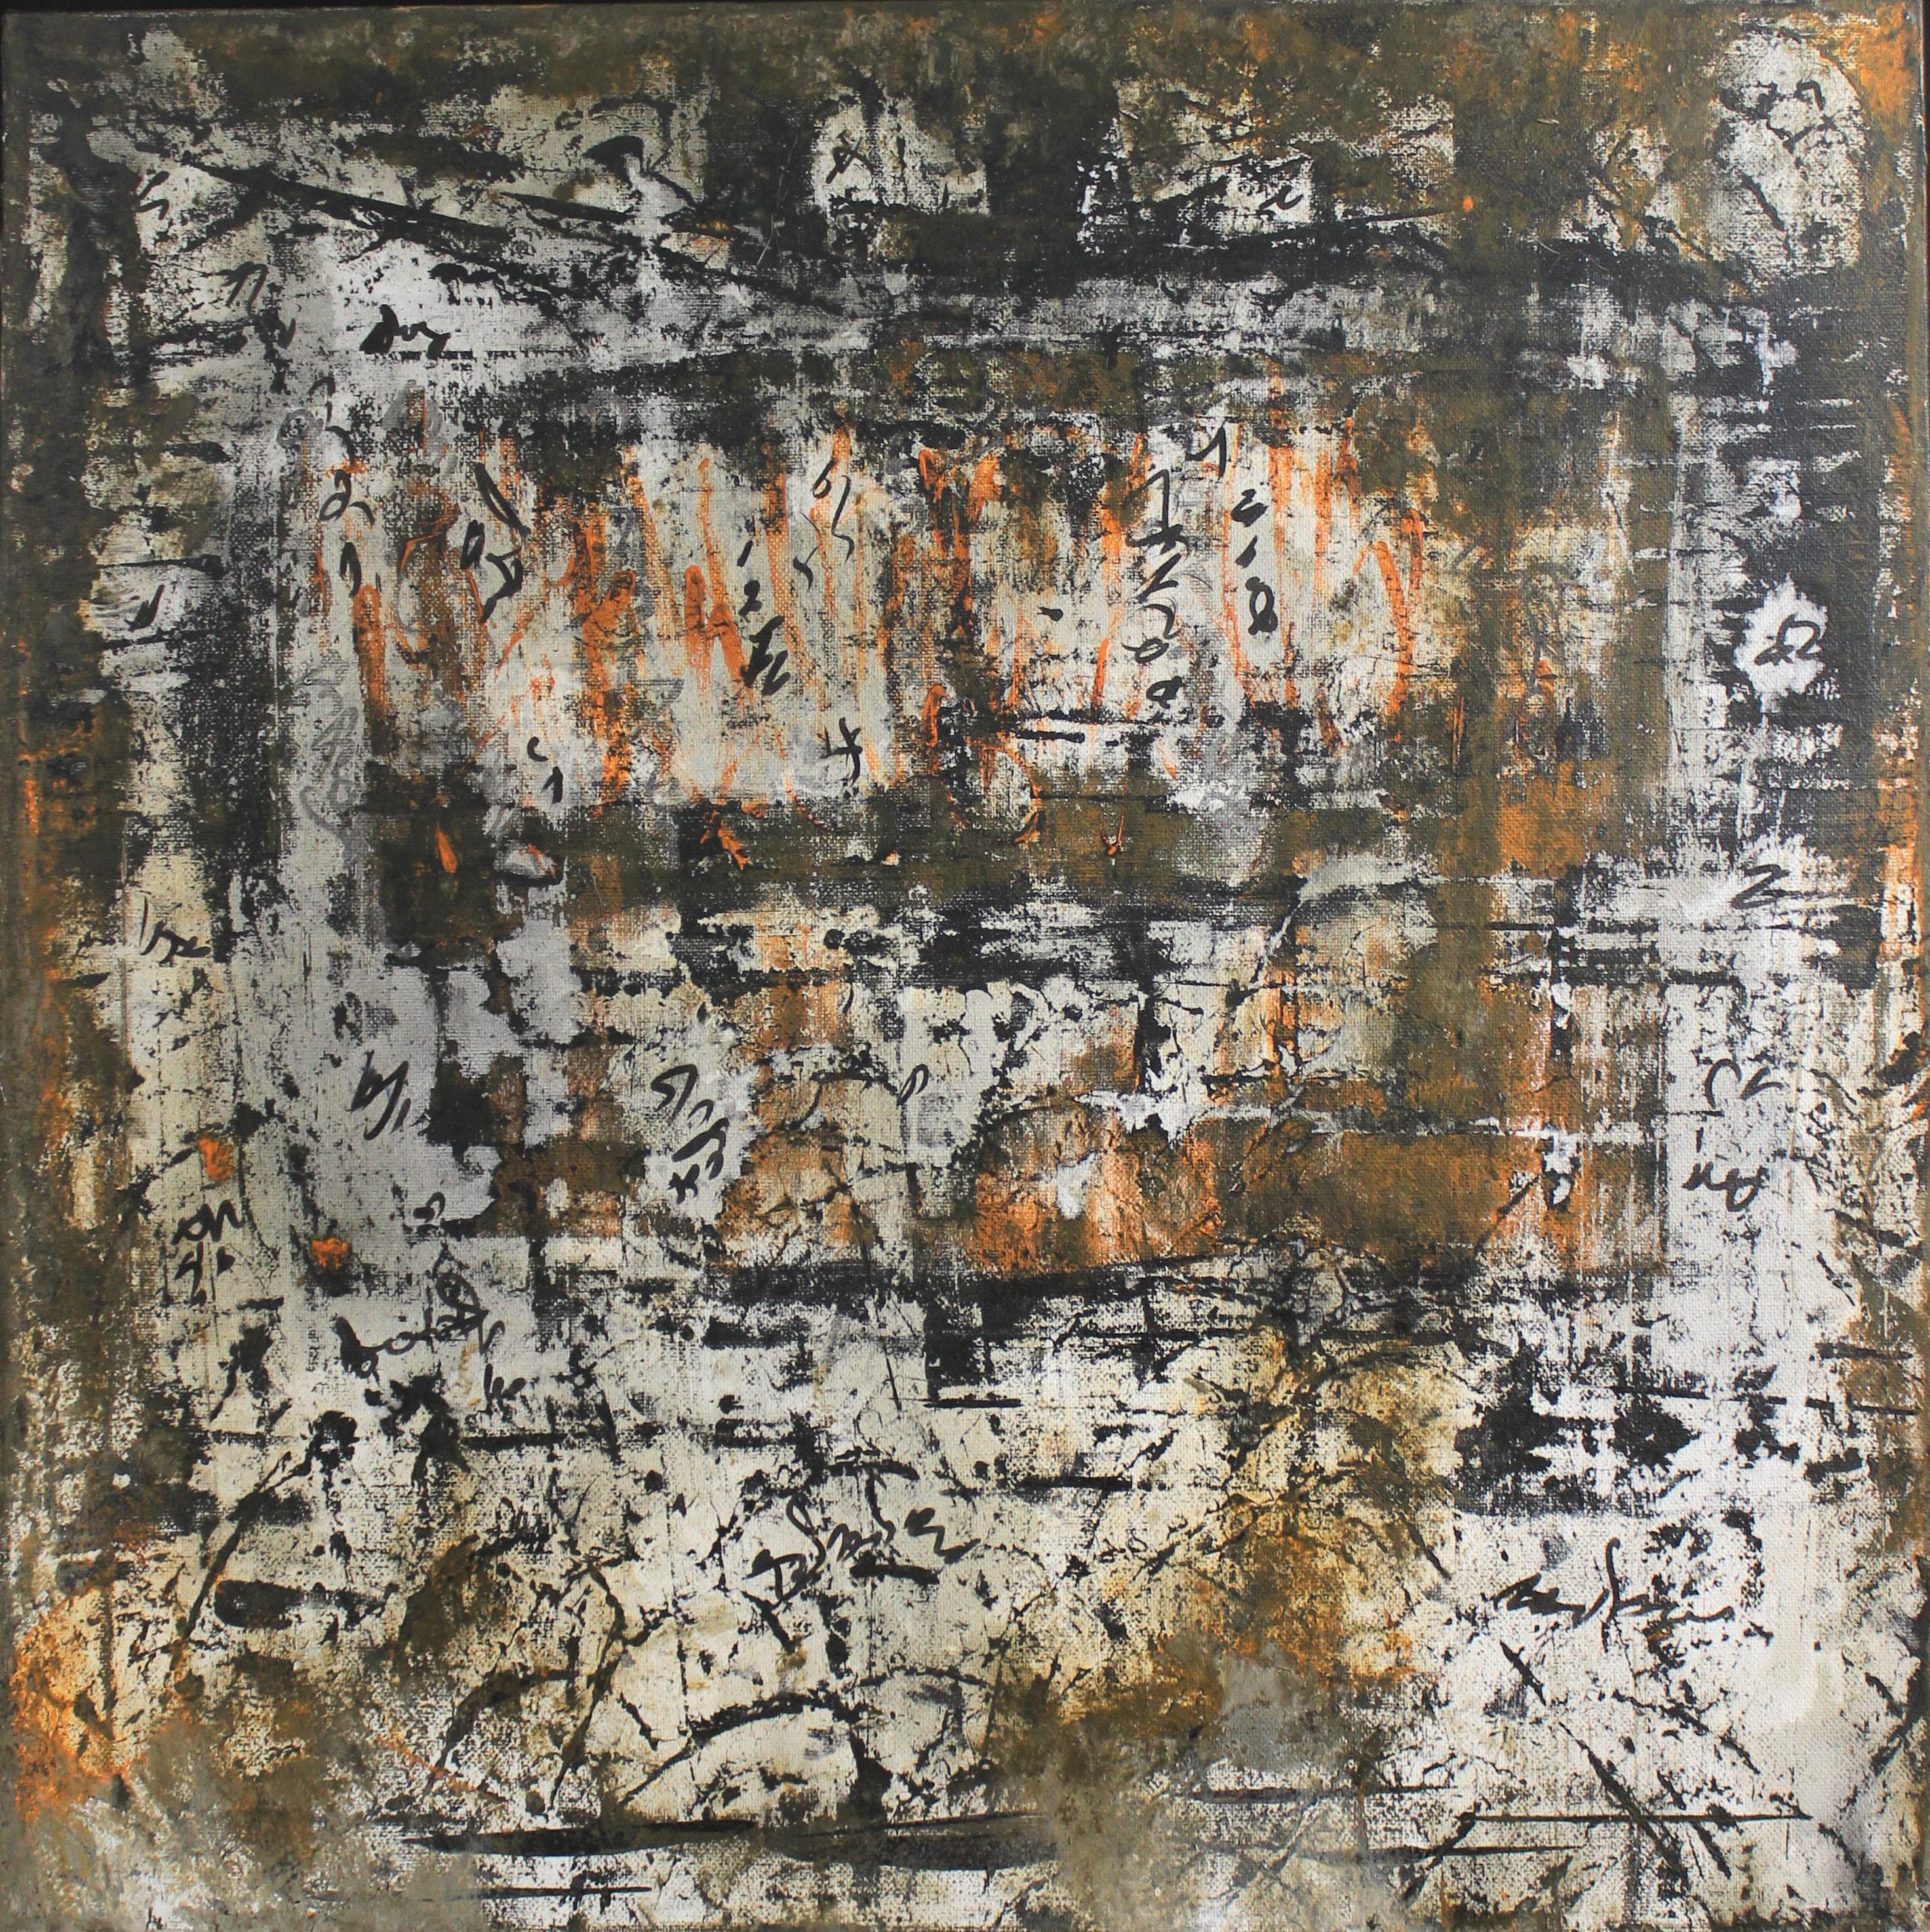 G Kim Hinkson - Writing On The Wall Abstract Acrylic Painting 20x20